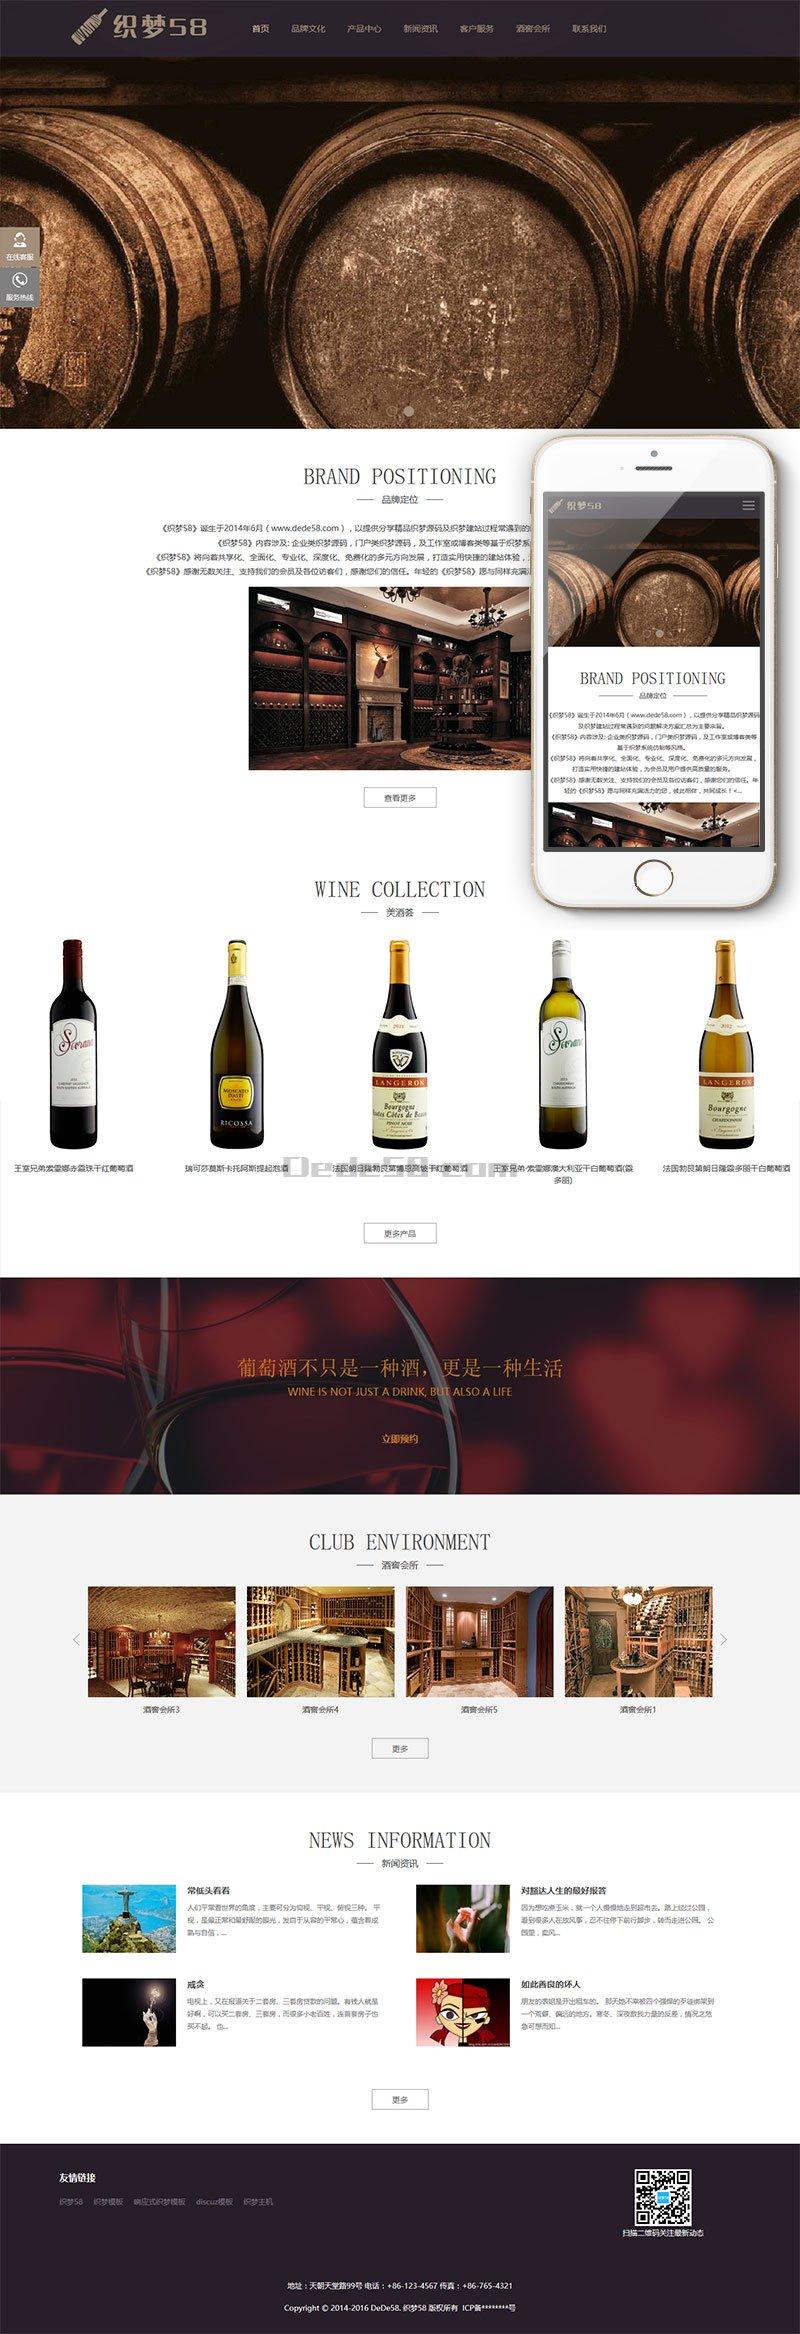 XL-009.响应式高端藏酒酒业酒窖企业网站